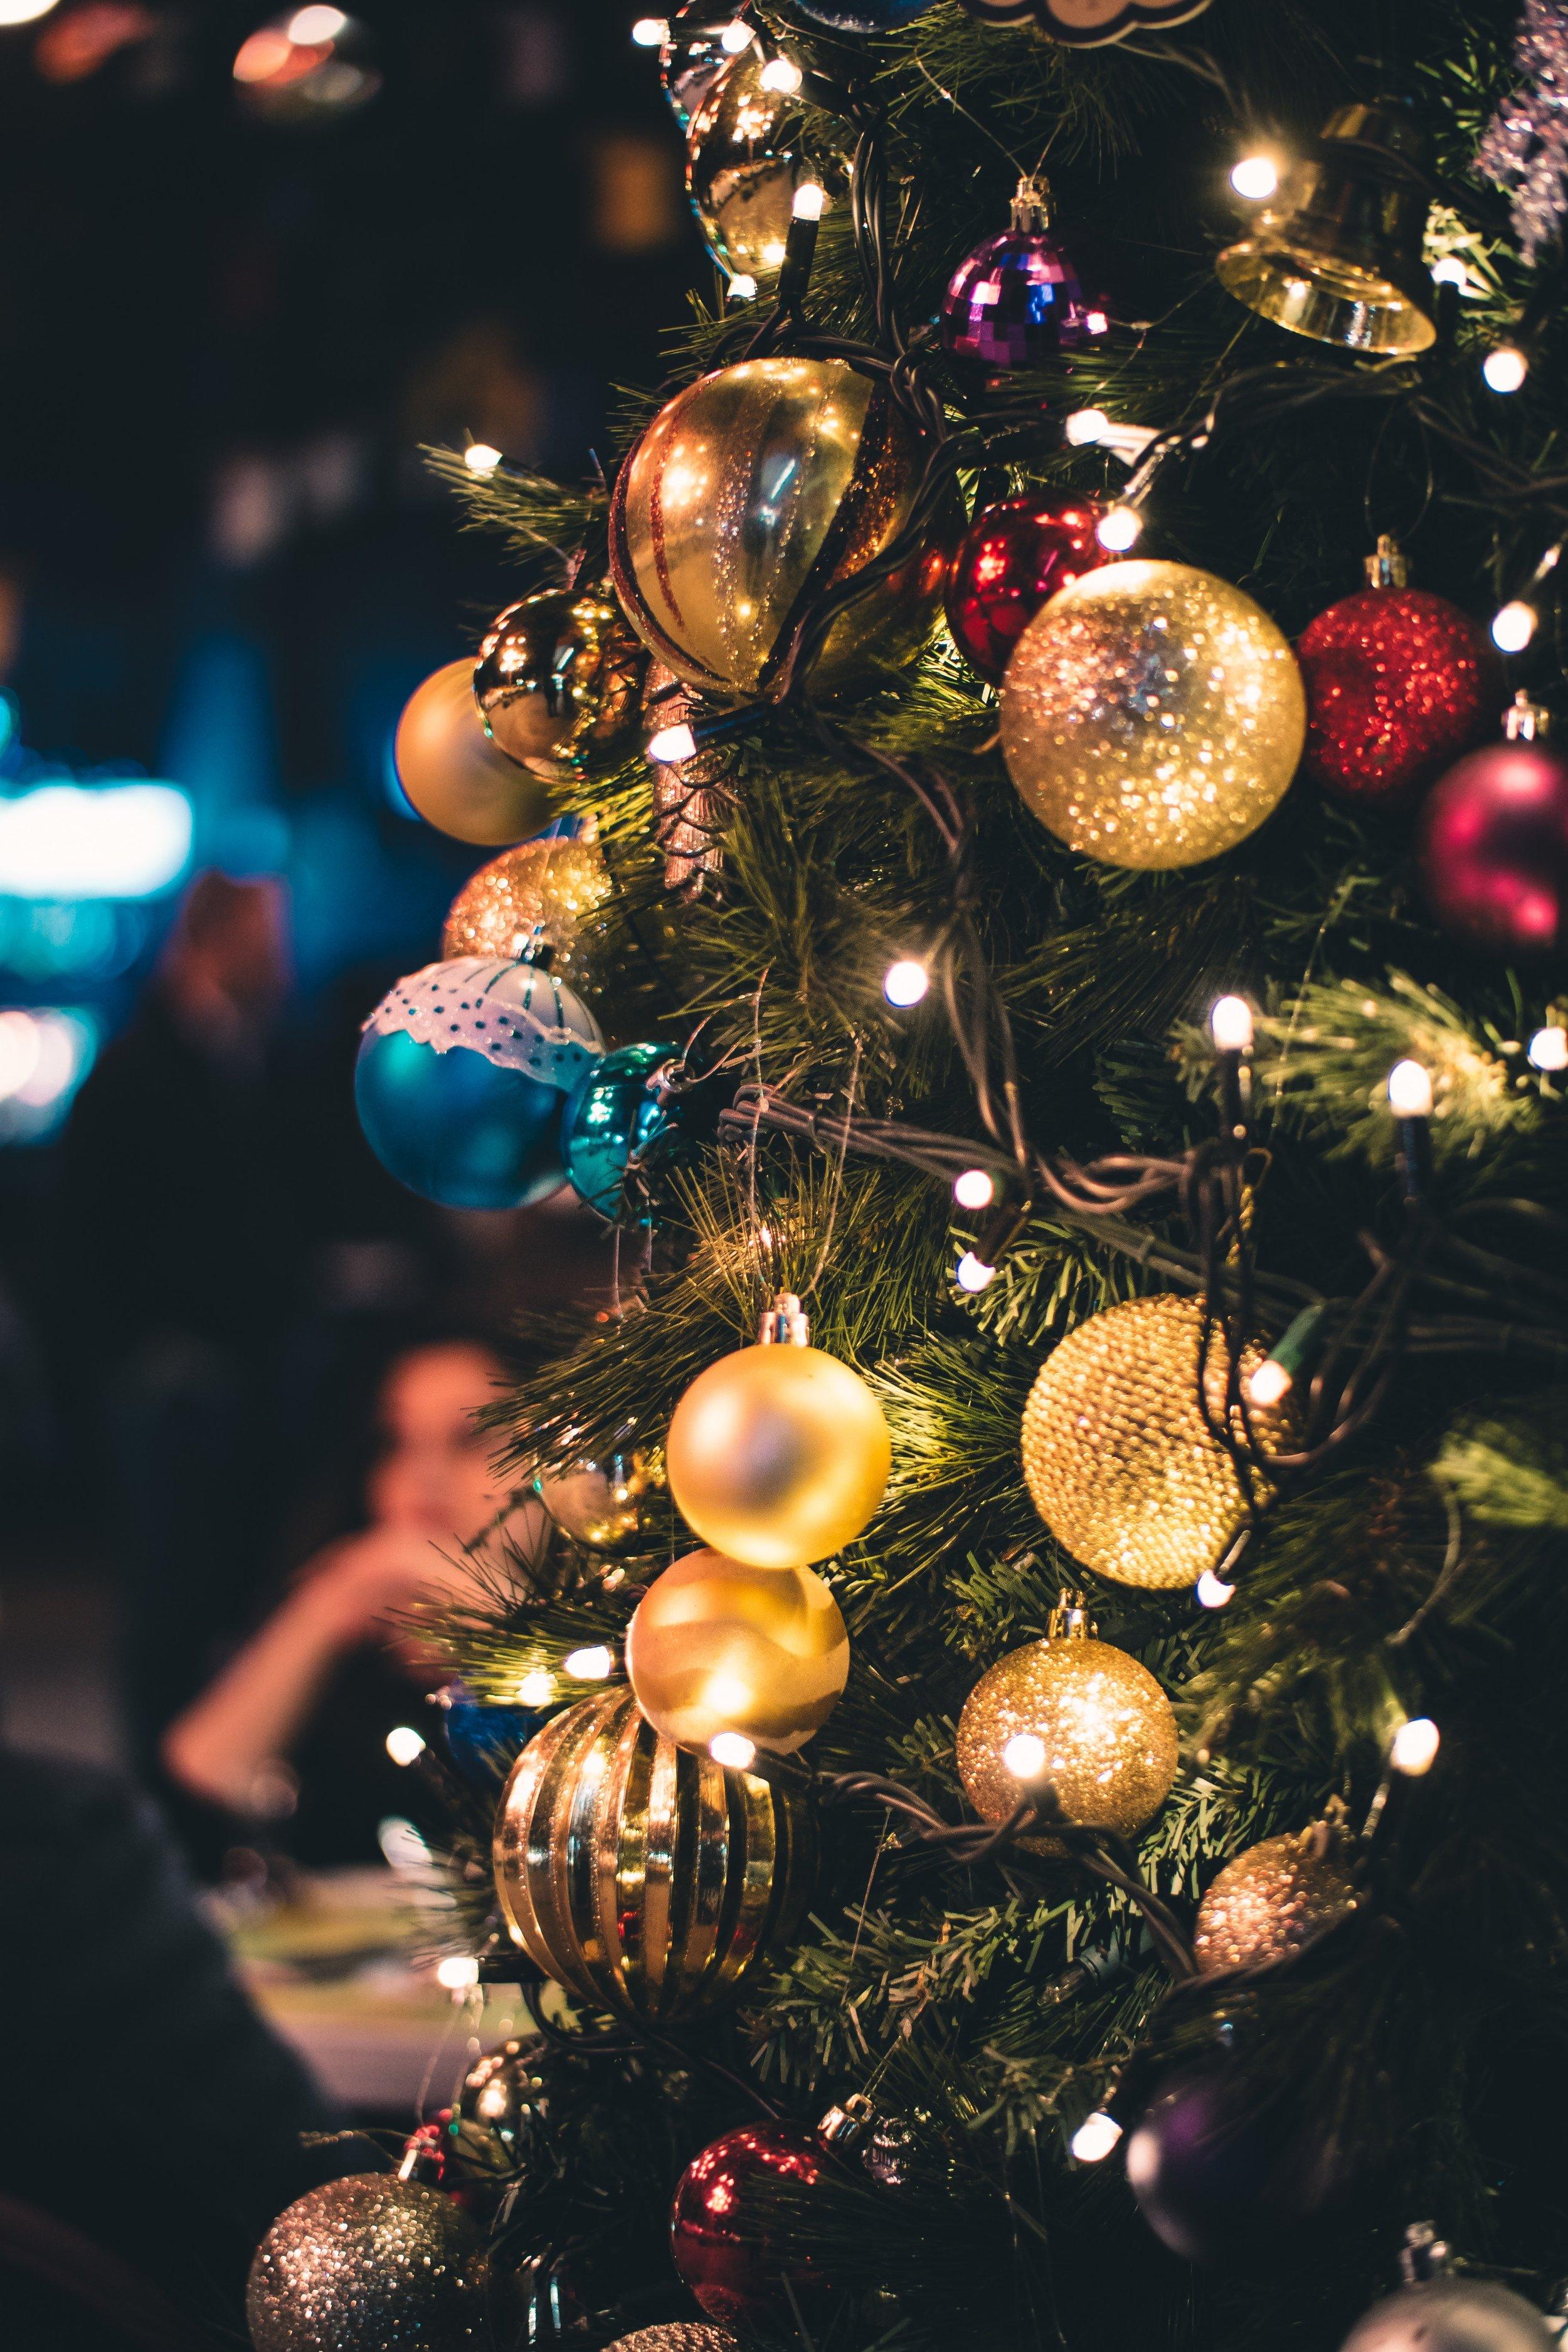 balls-blurred-background-christmas-724375.jpg